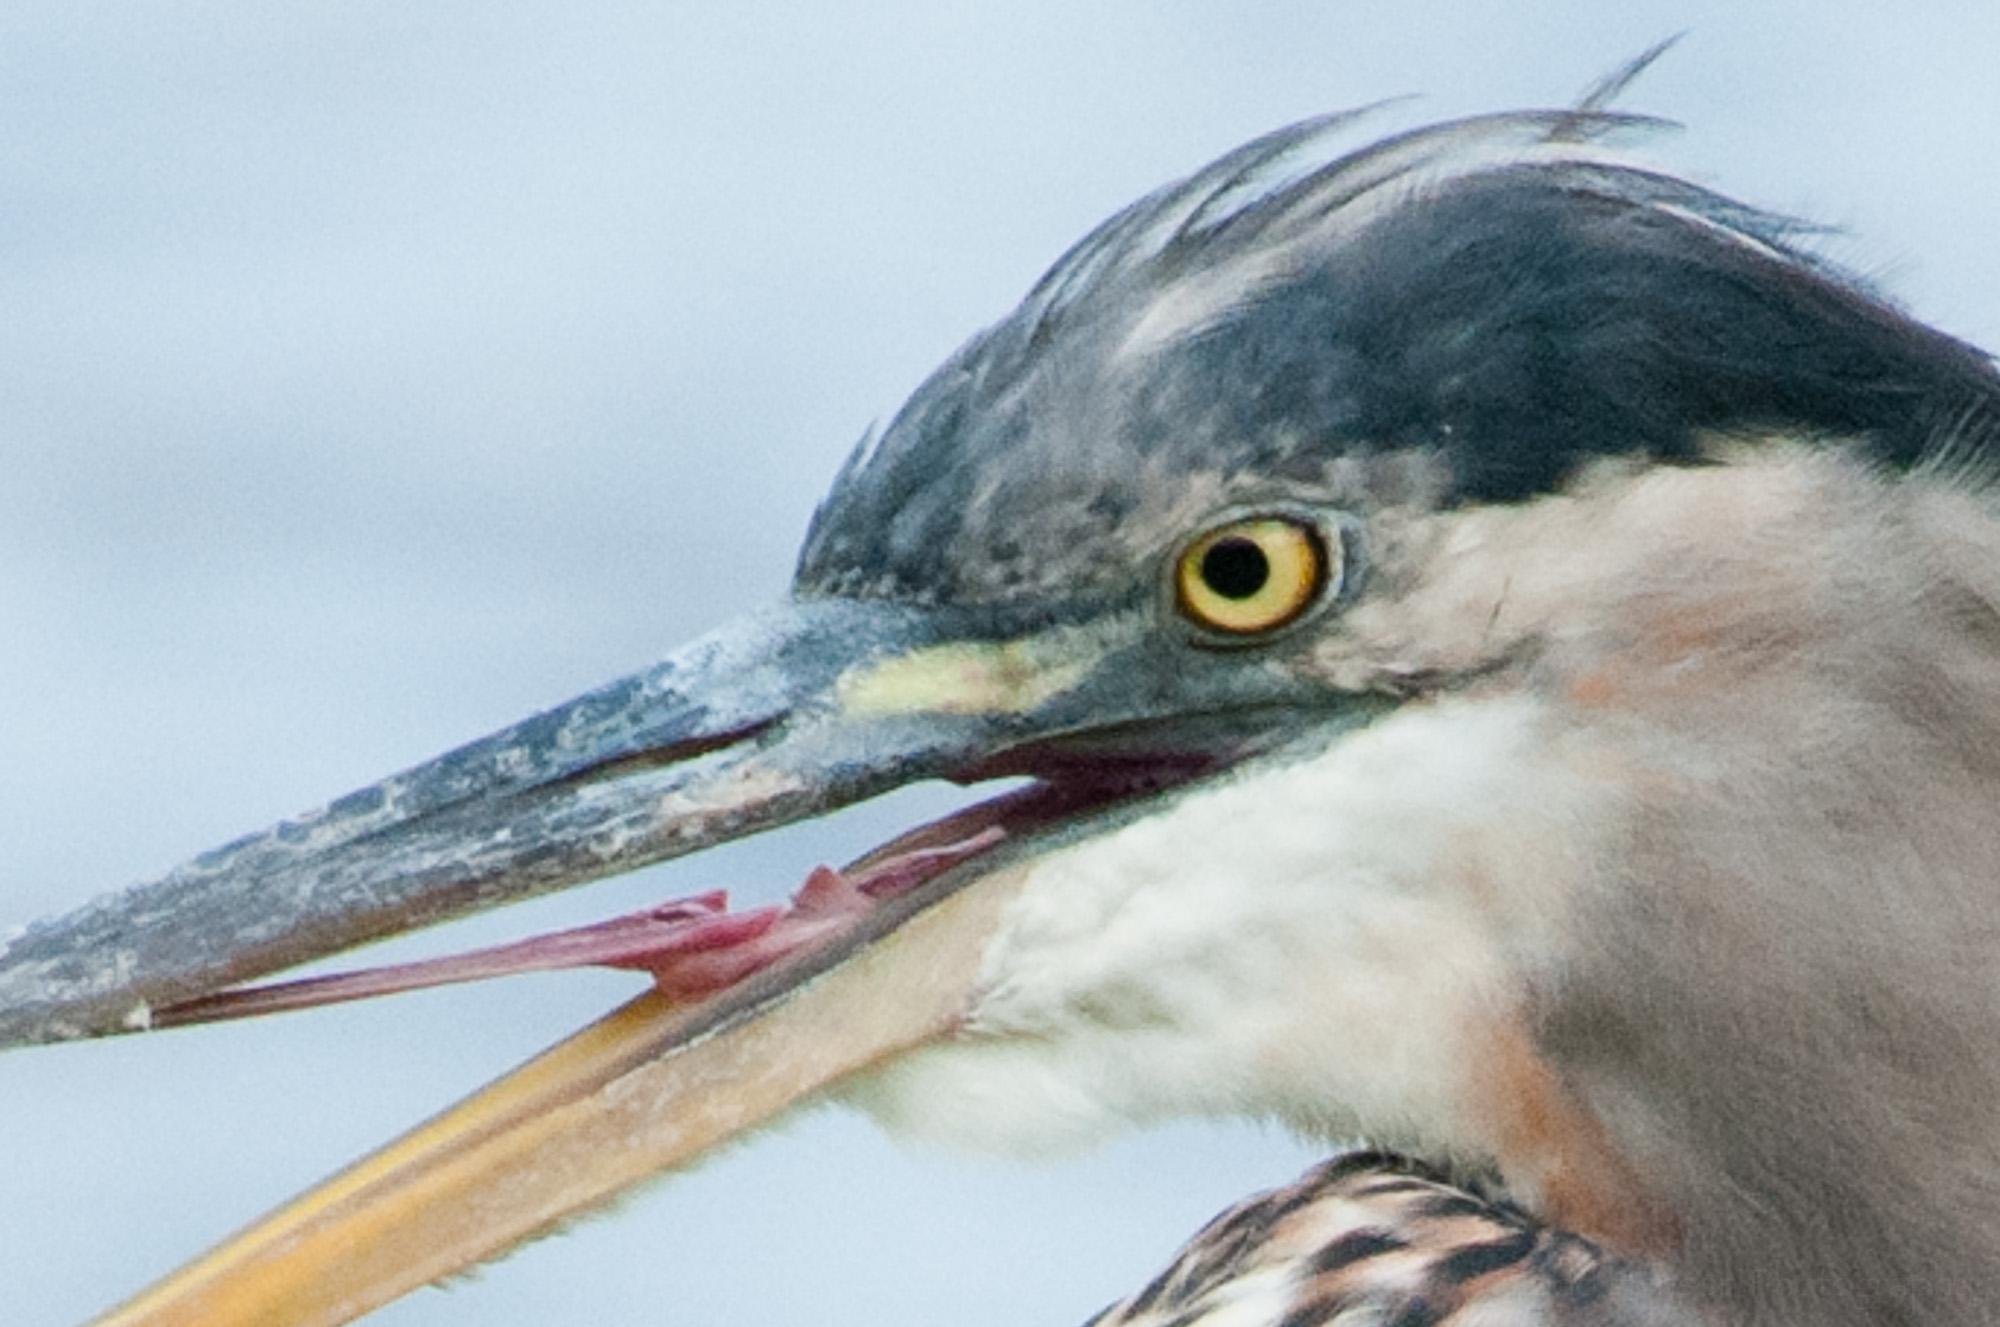 Great Blue Heron with eye (and beak) open.